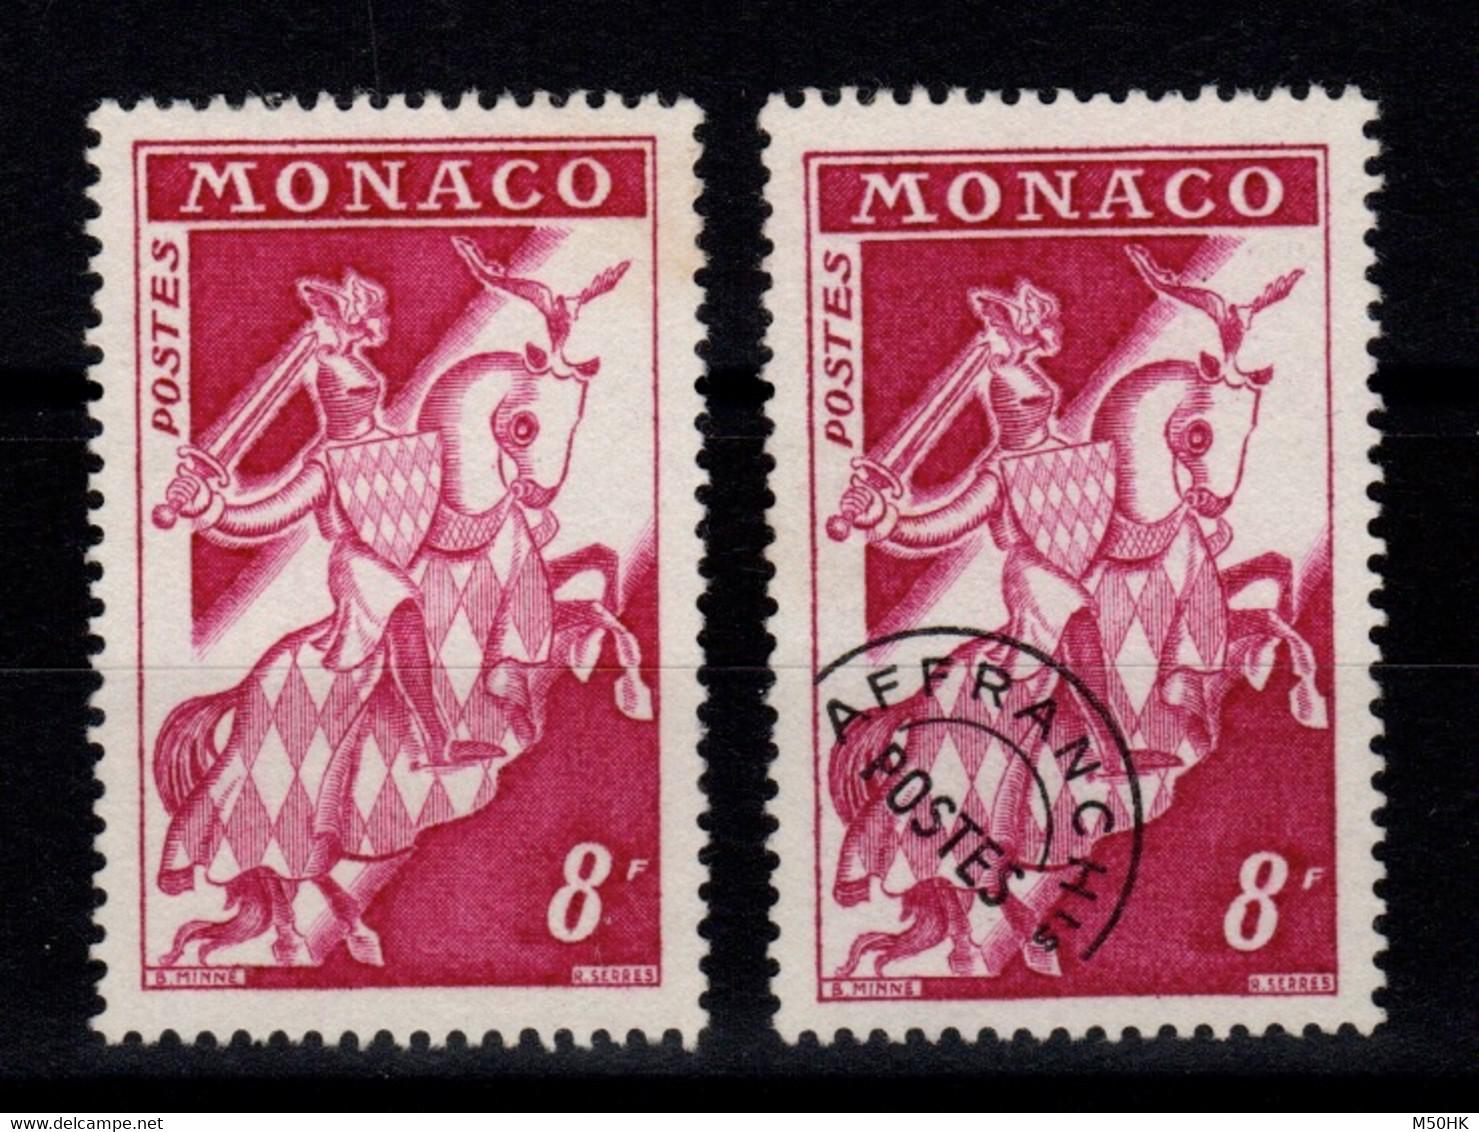 RRR - Monaco - Variete - YV 12Aa Surcharge Absente NSG MNG (*) + 1 Normal - Precancels